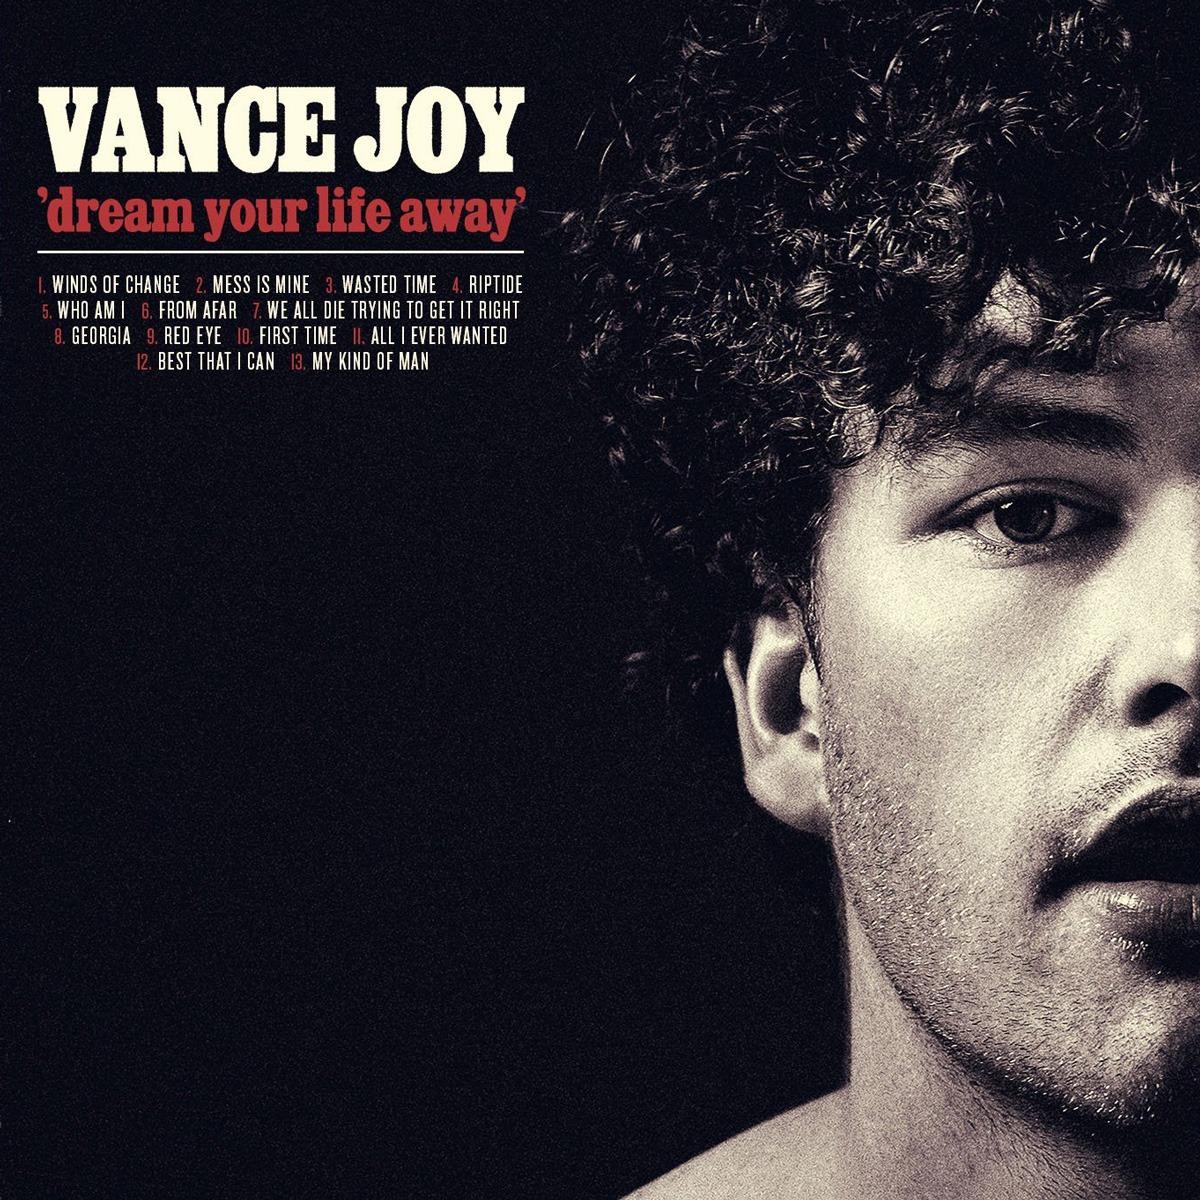 Vance Joy Dream Your Life Away